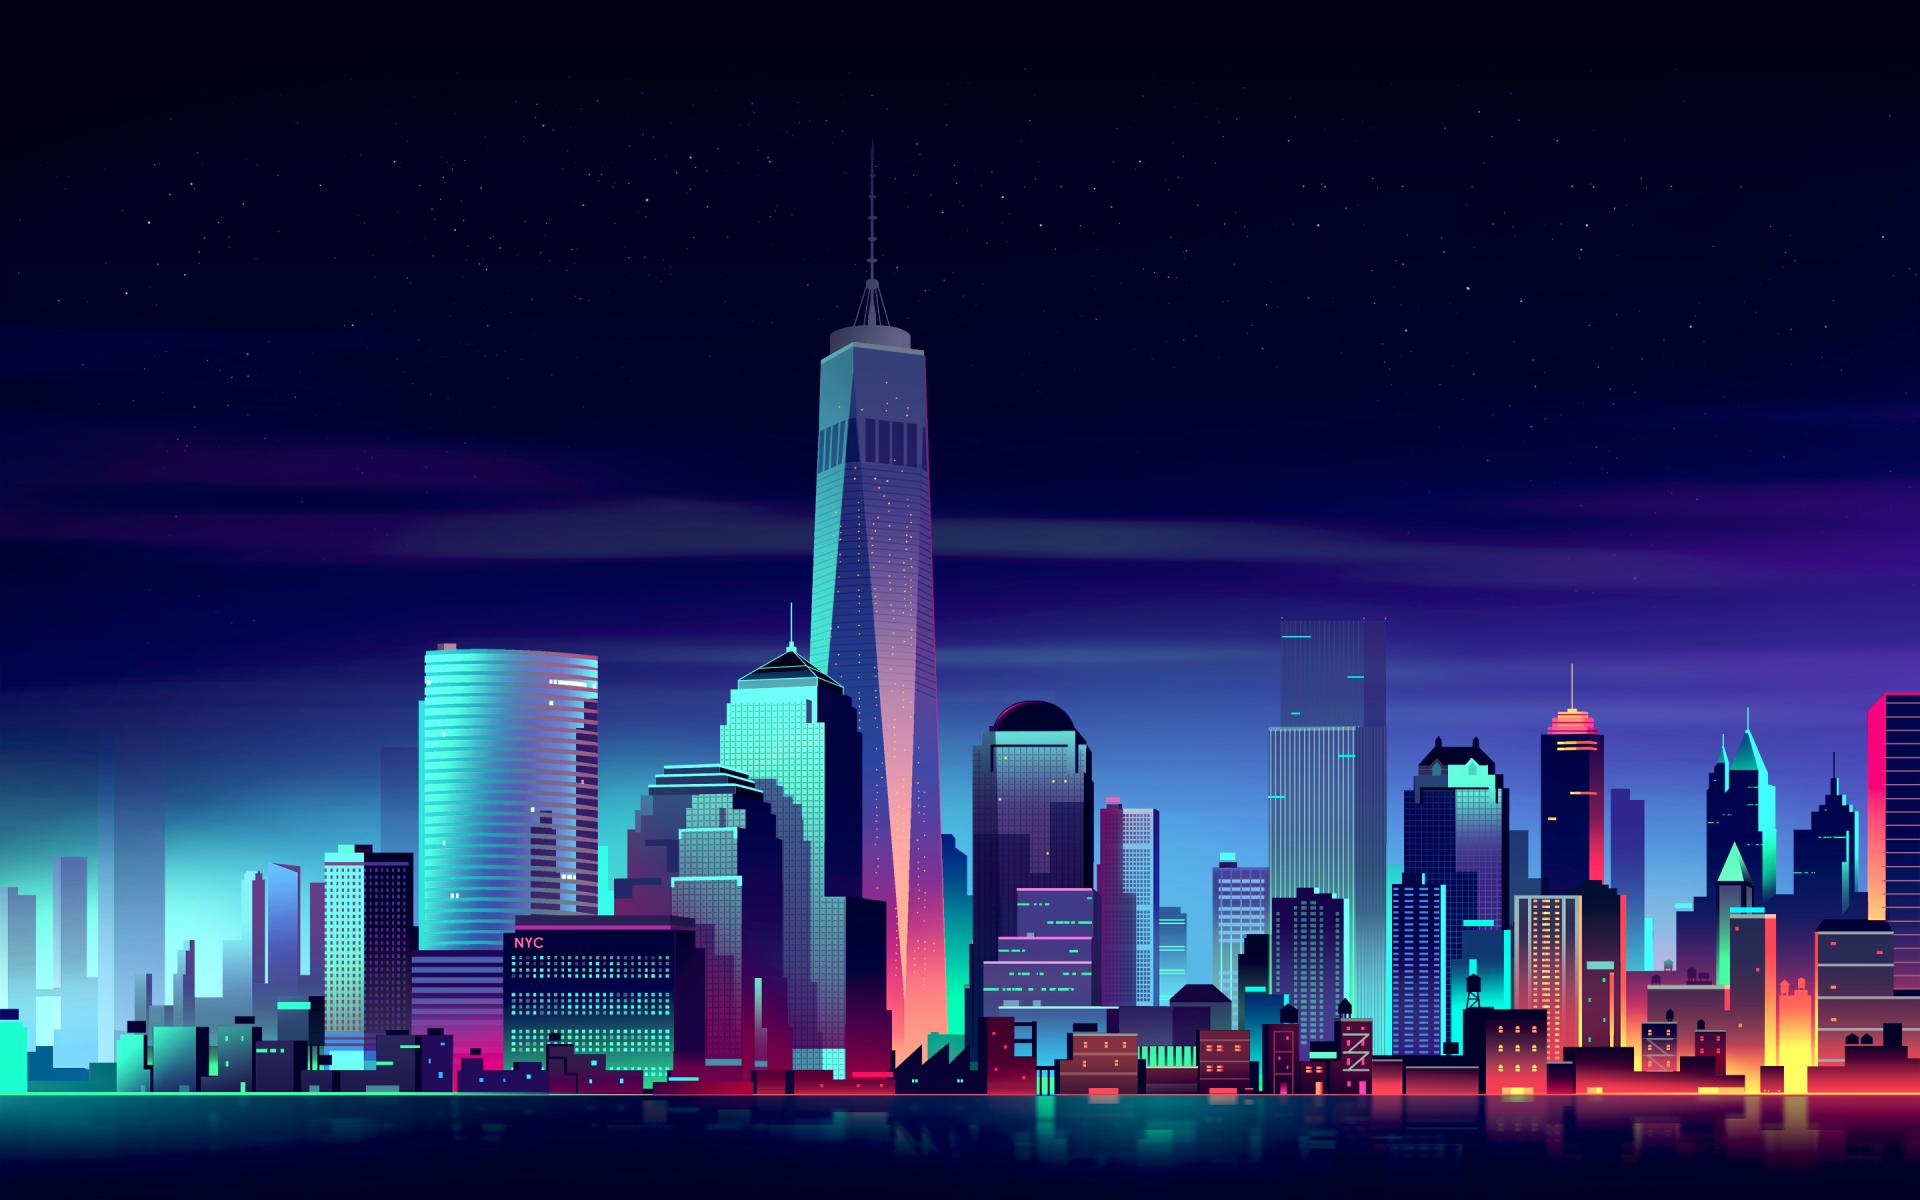 Man Made - New York  Skyscraper Stad Cityscape Artistisk Bakgrund